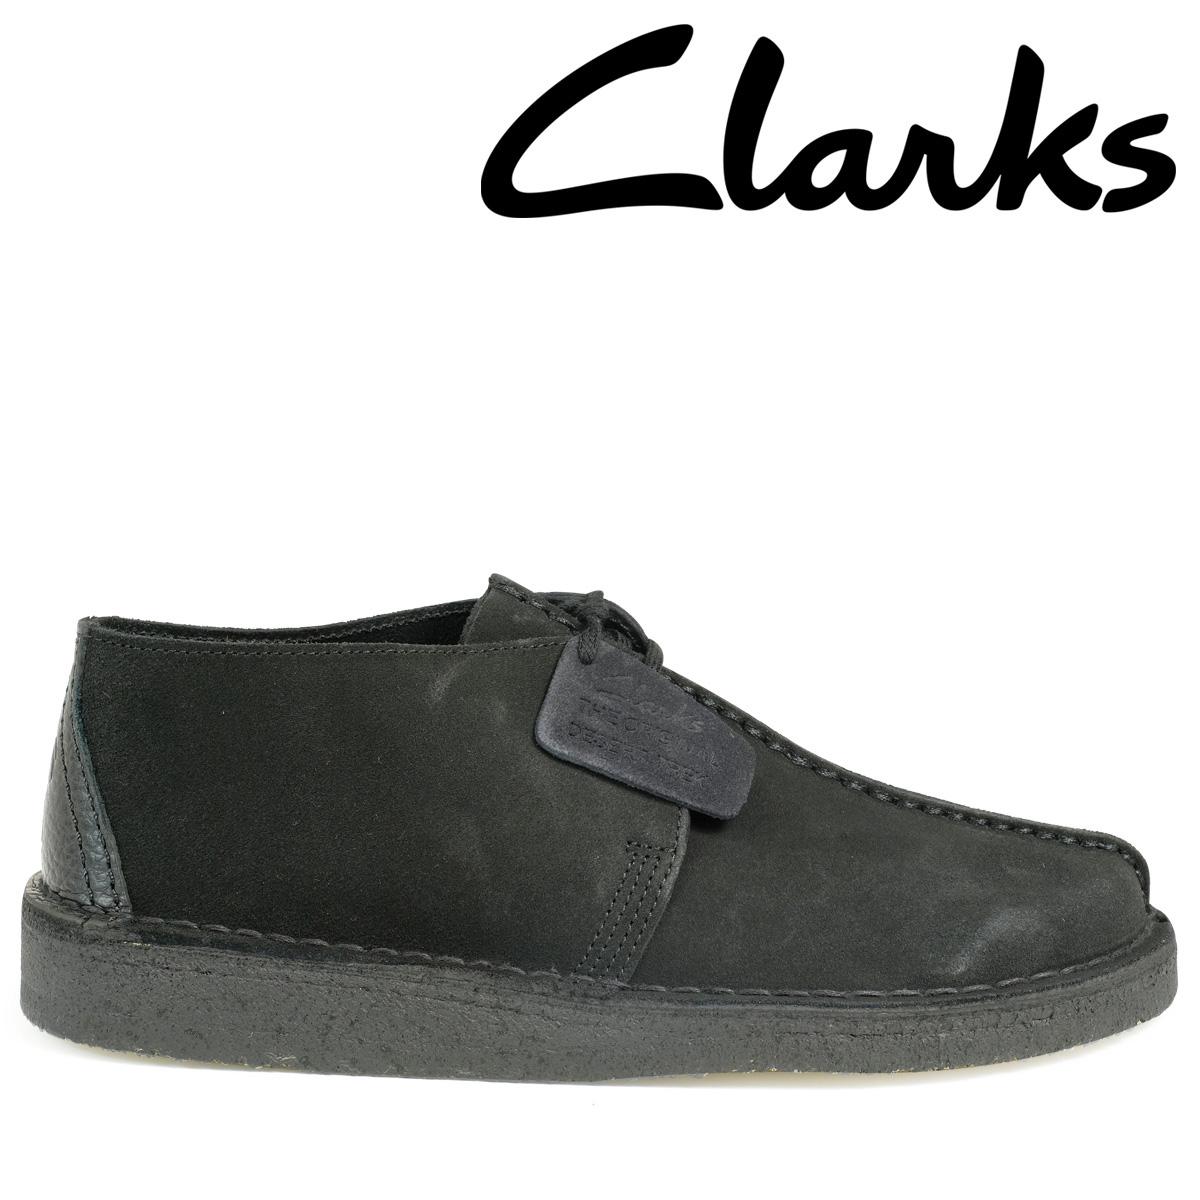 Clarks デザートトレック ブーツ クラークス メンズ DESERT TREK 26113258 靴 ブラック 黒